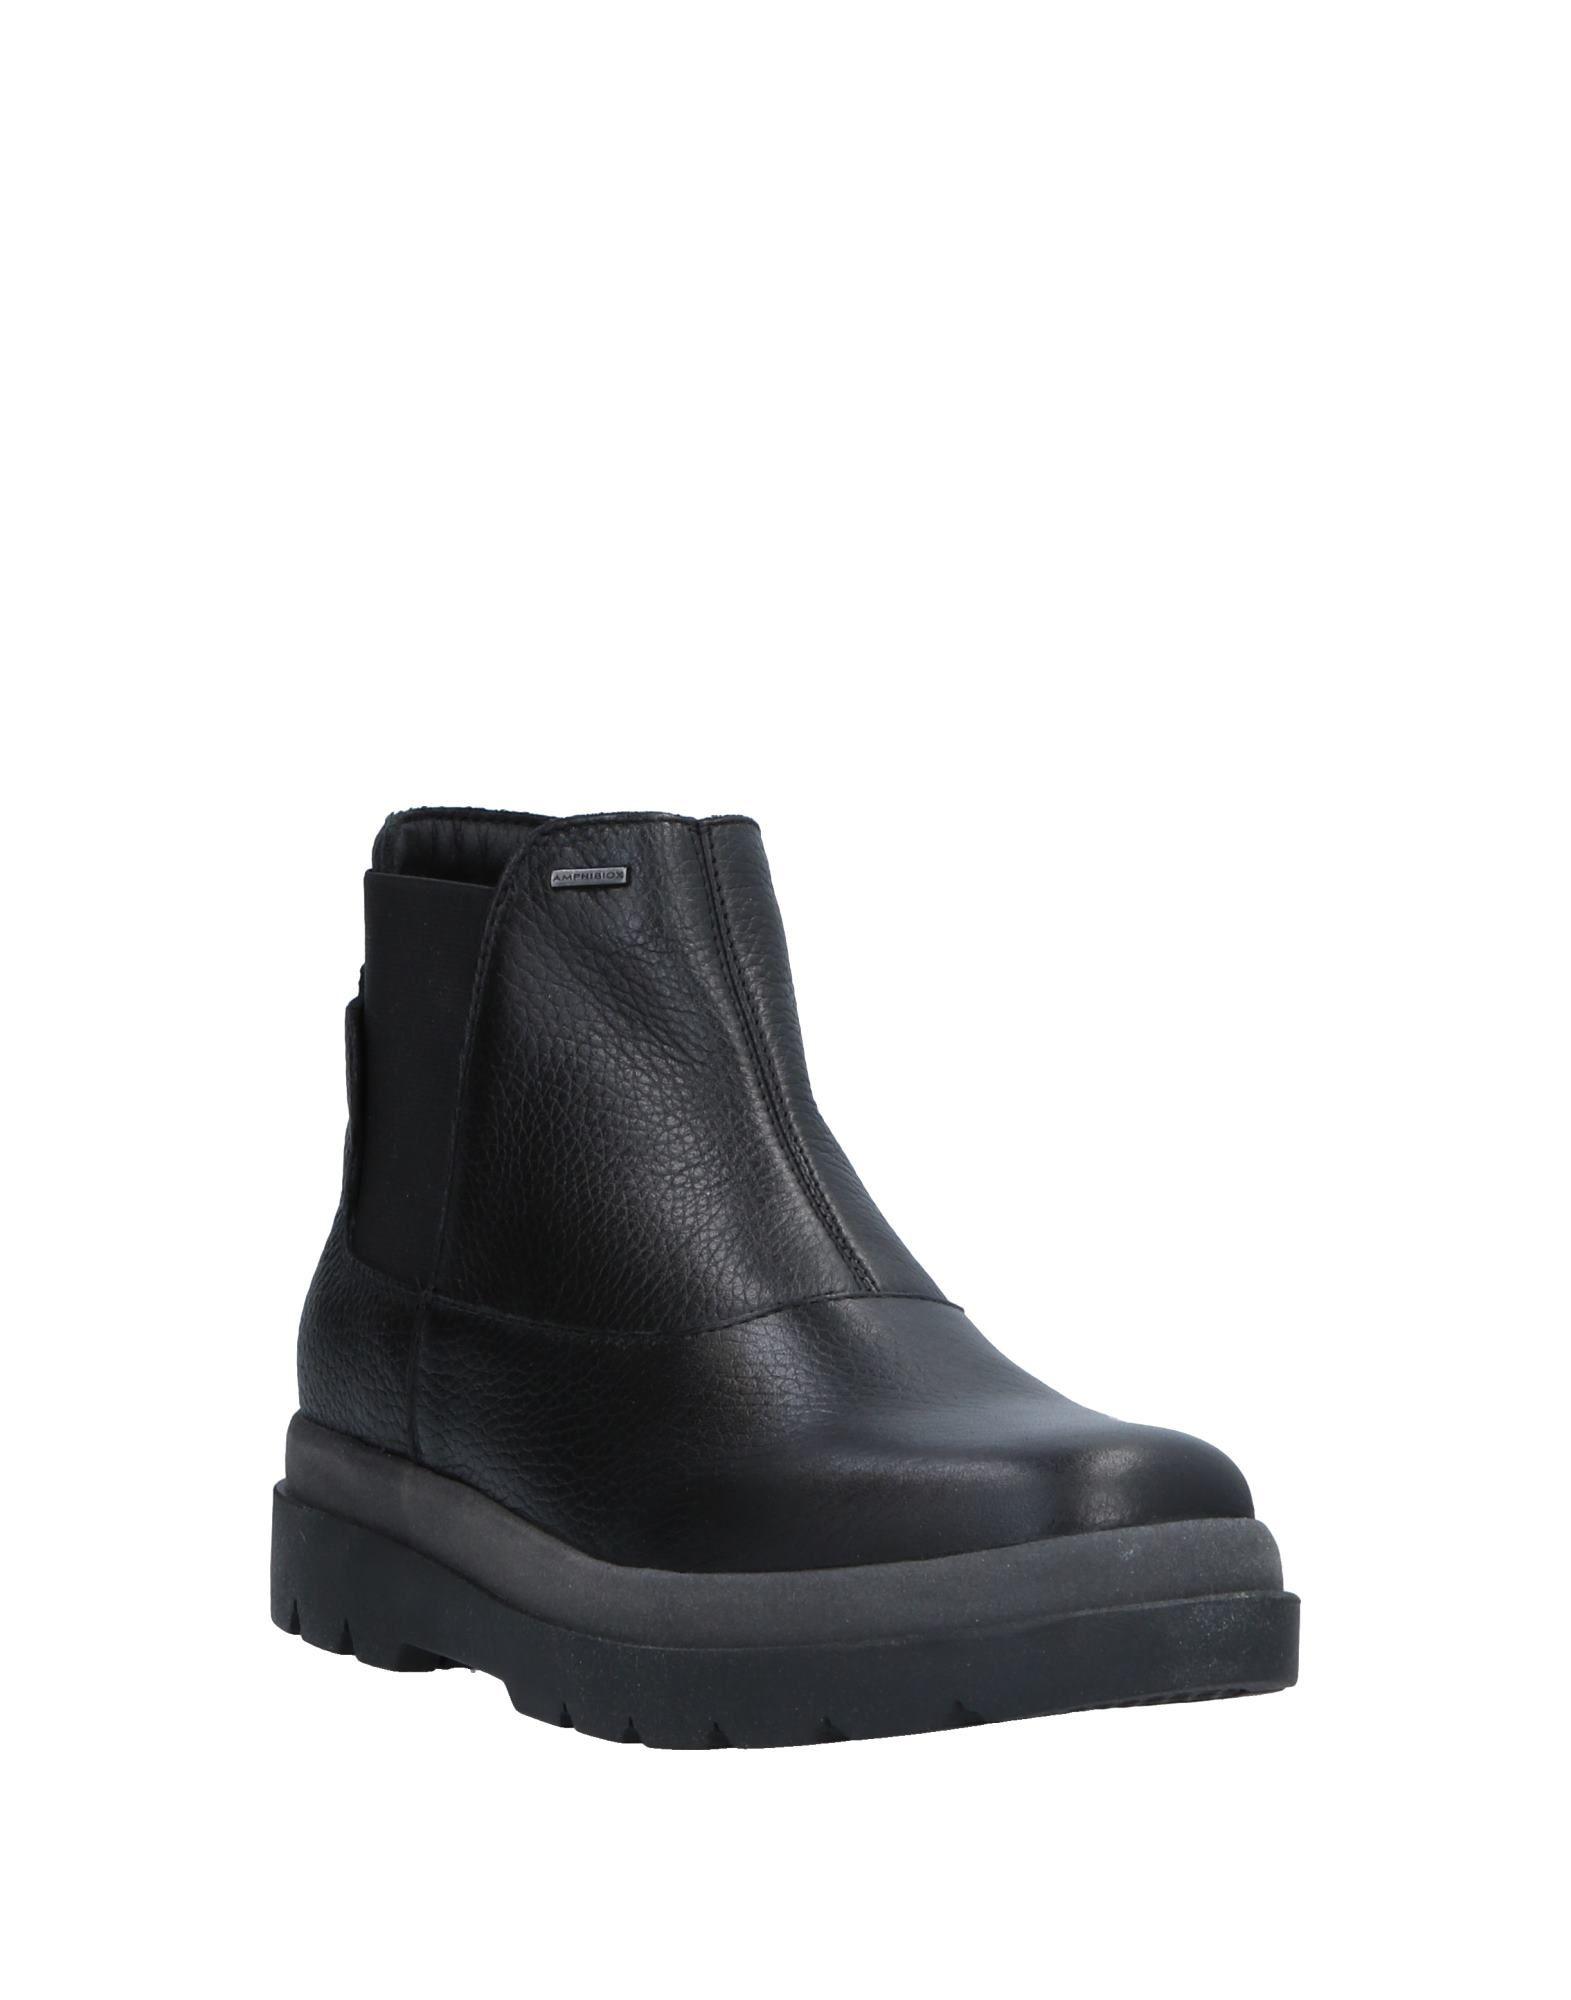 Geox Chelsea Boots Damen  11542277HL Gute Qualität beliebte Schuhe